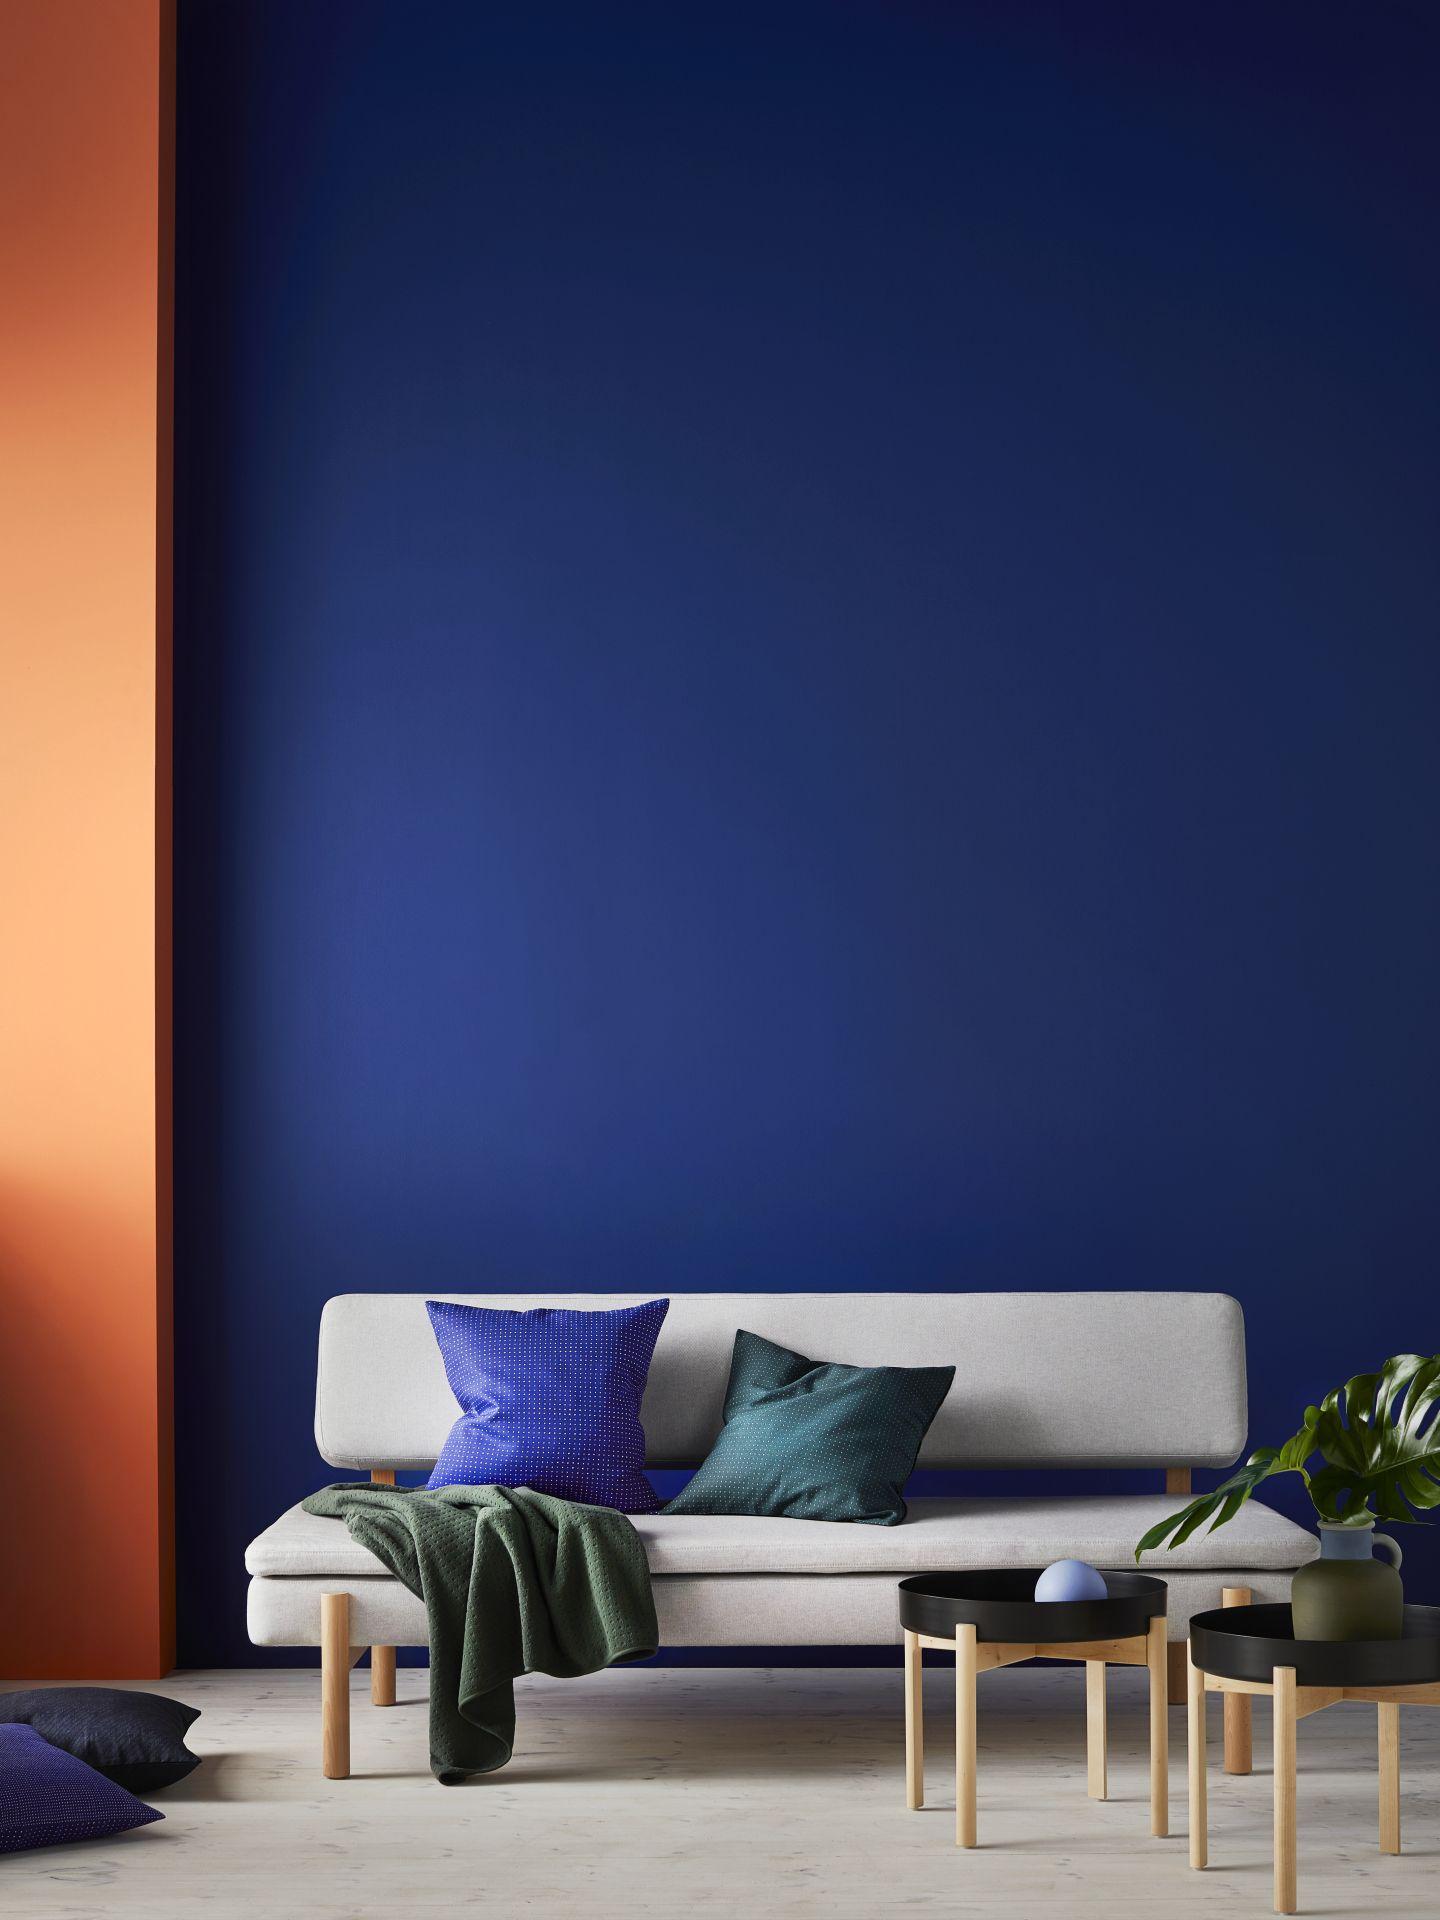 Ikea Blauwe Slaapbank.Ypperlig 3 Zits Slaapbank Orrsta Lichtgrijs Ikea Deense